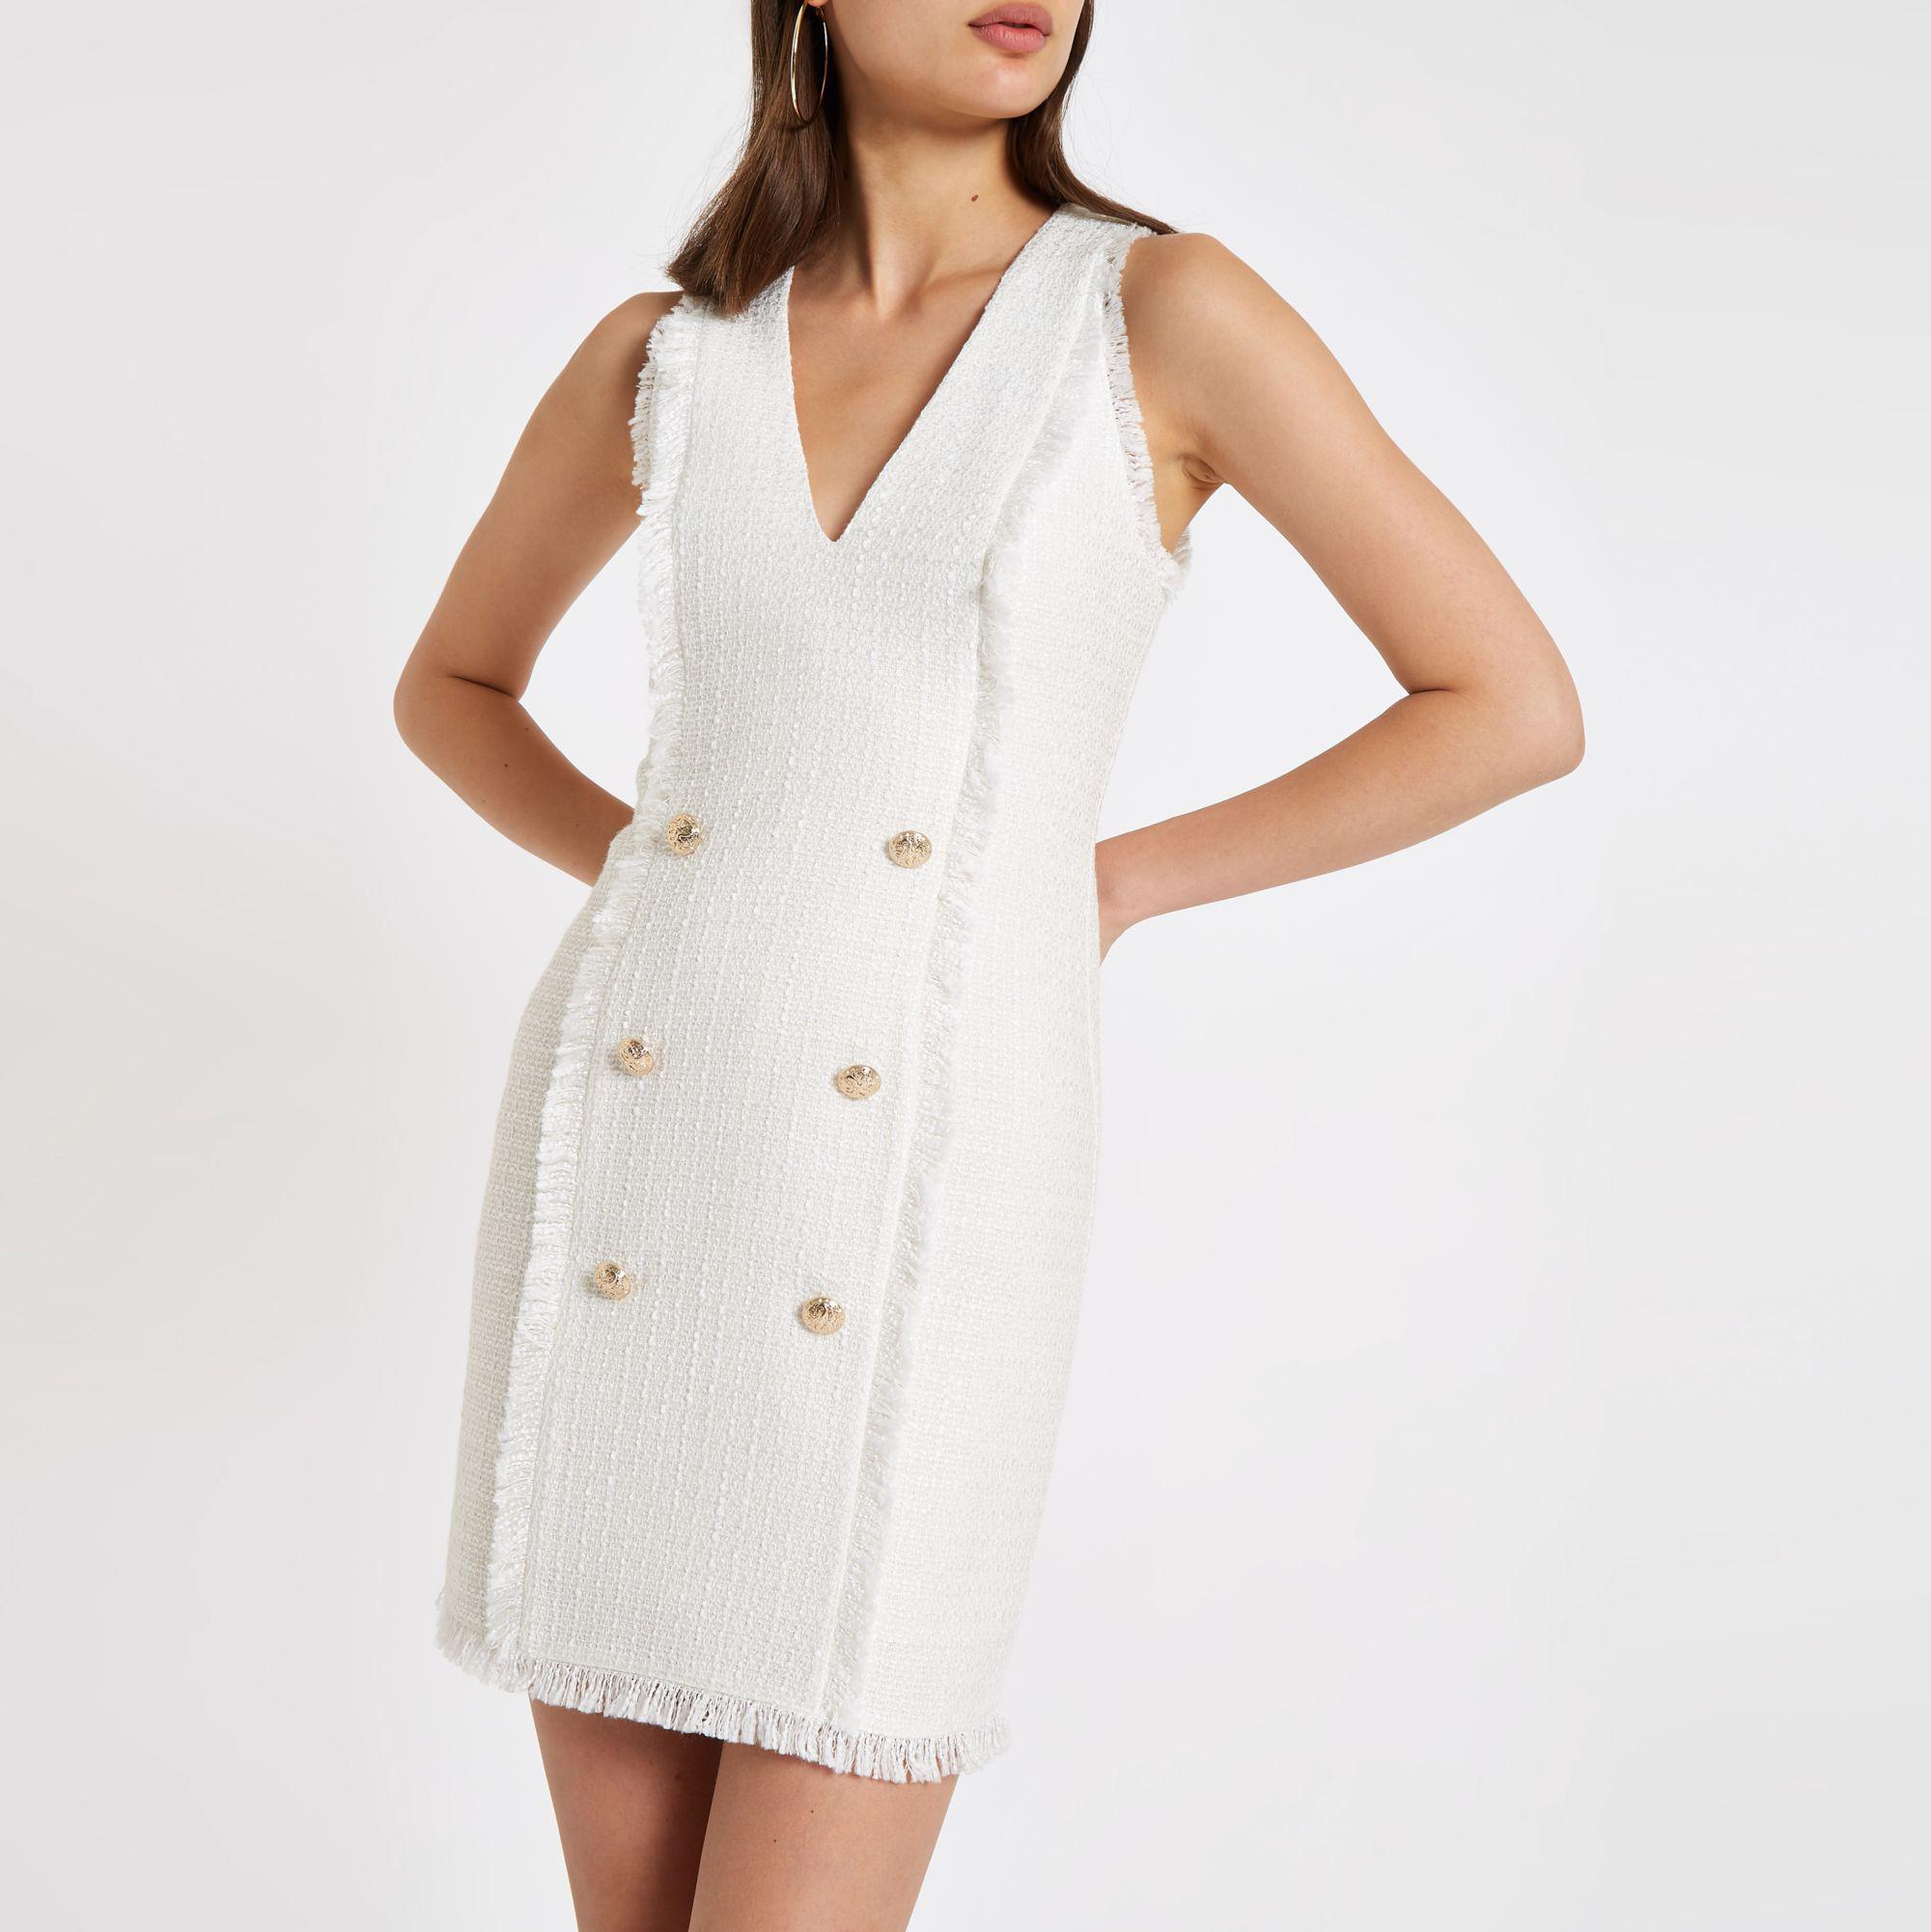 71d5dd82d49 River Island White Boucle Mini Bodycon Dress in White - Lyst